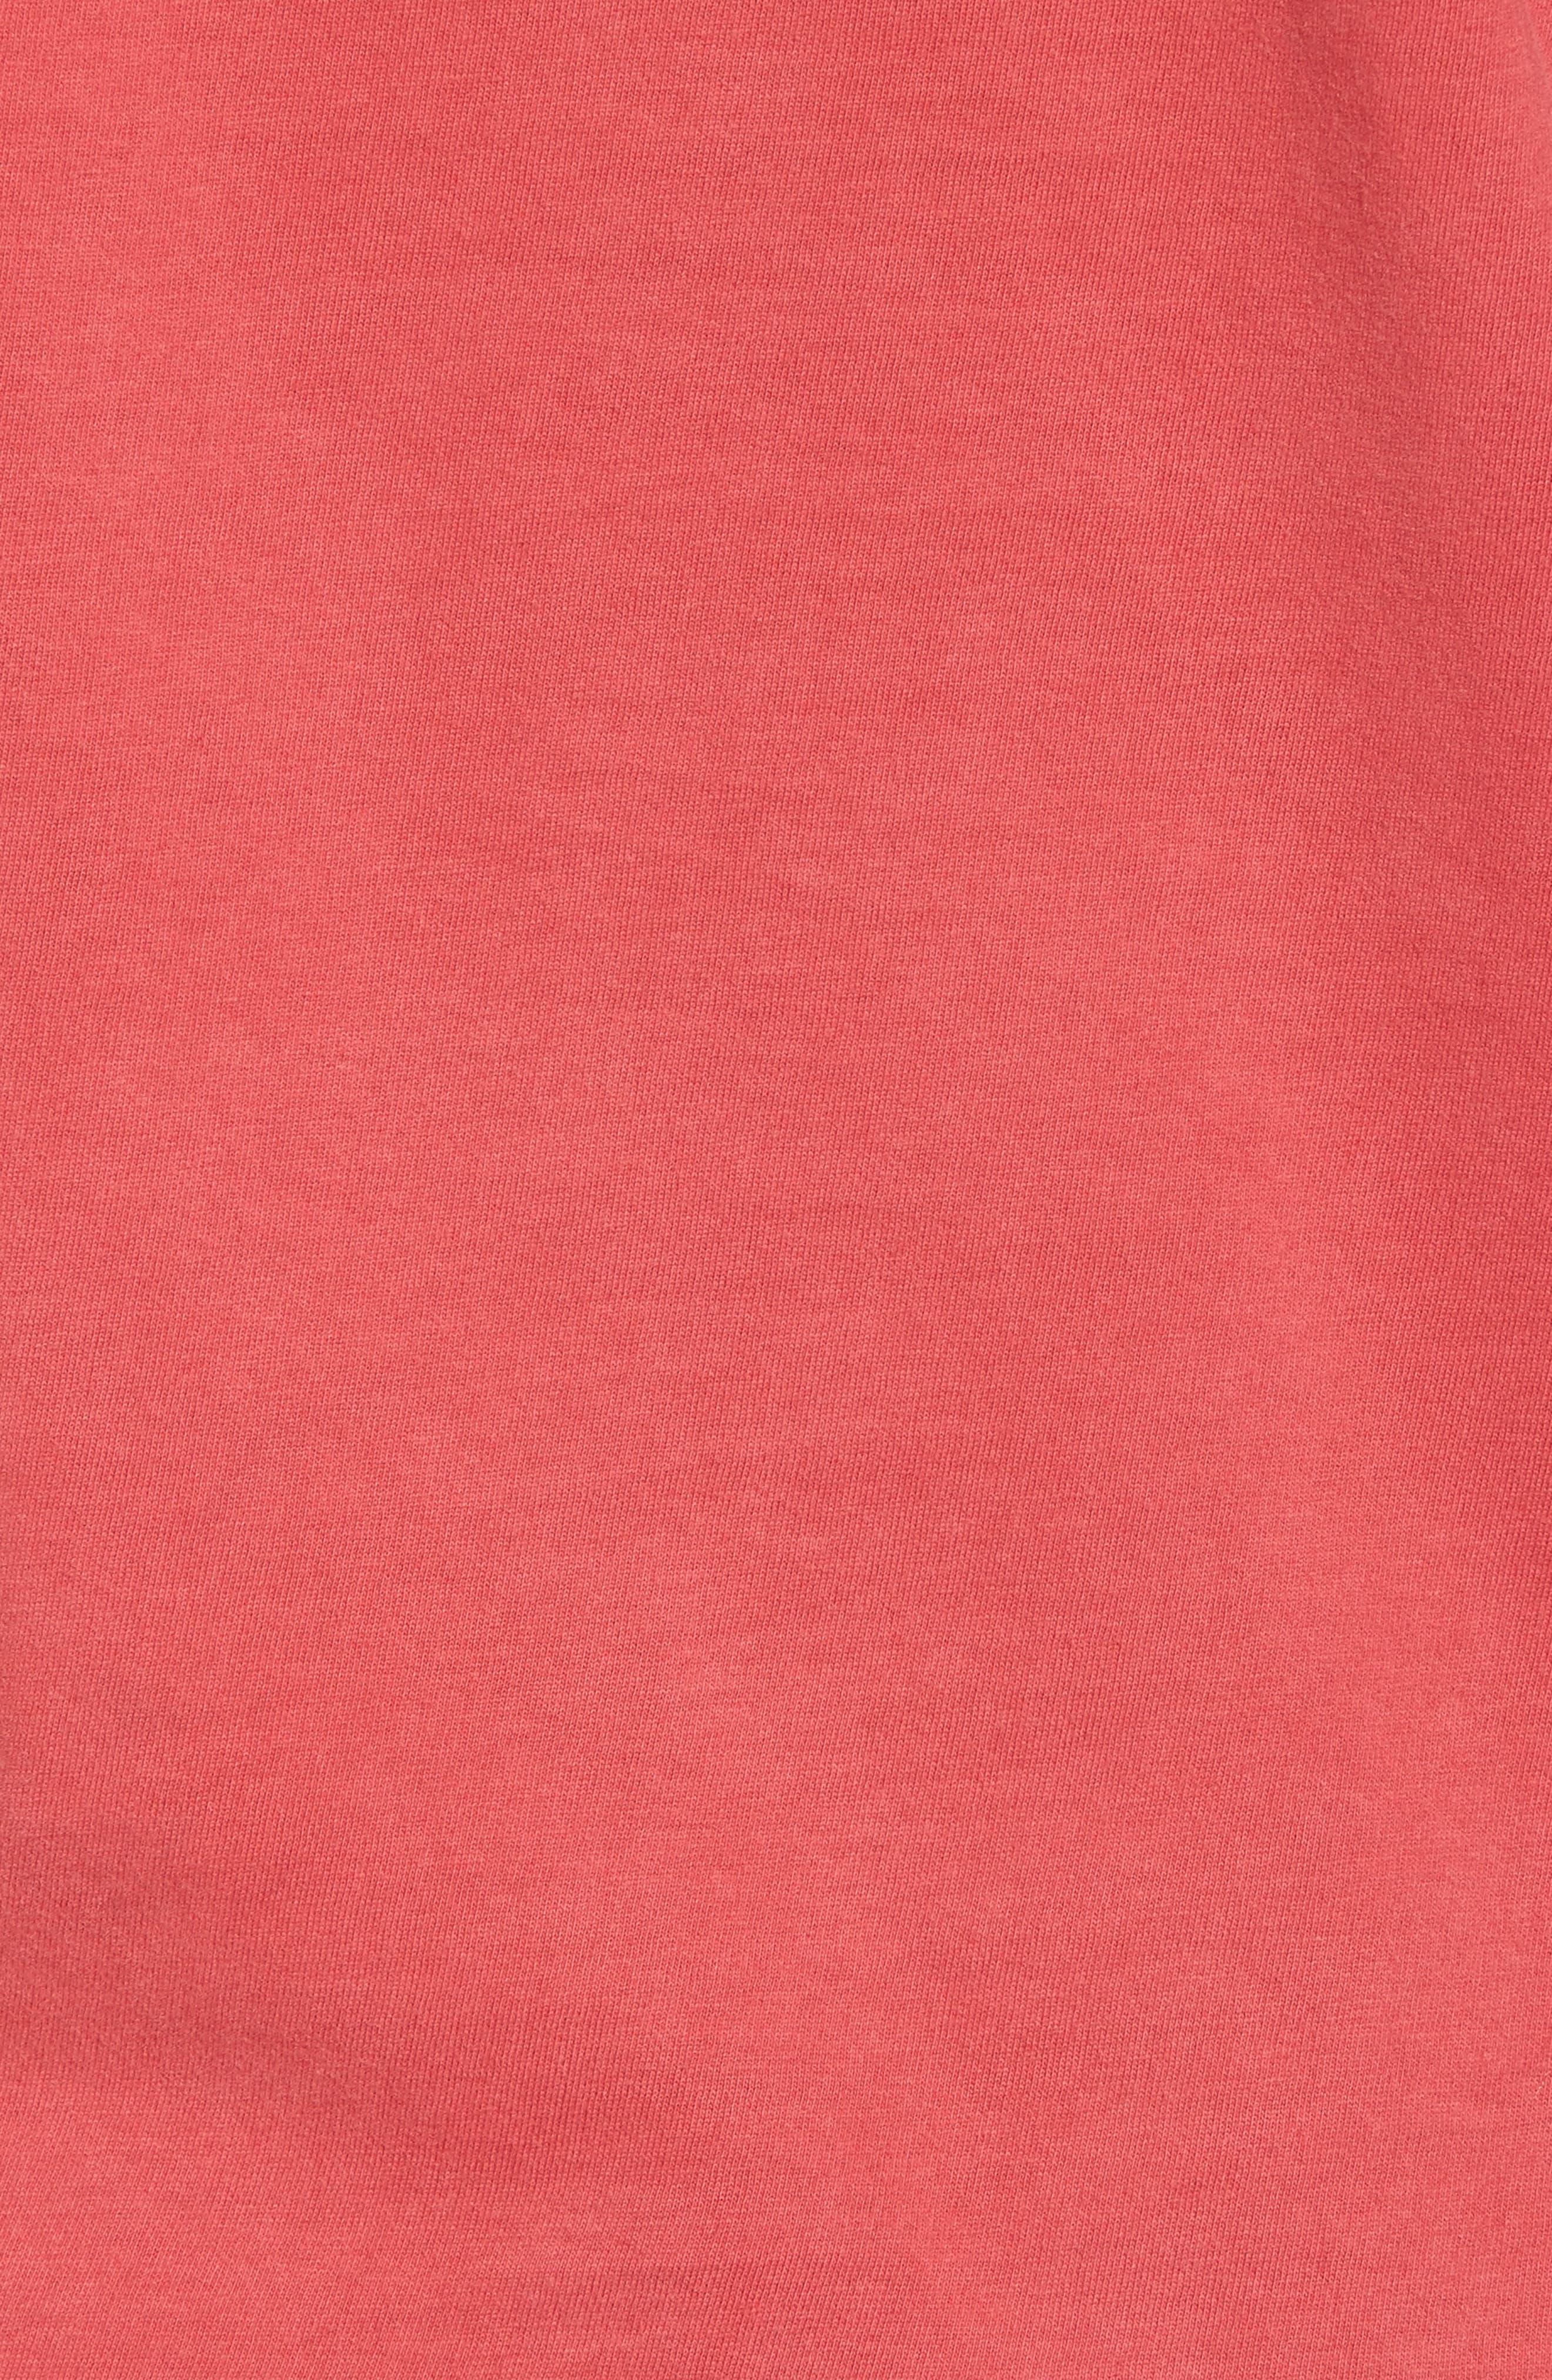 Gresham Red Wings T-Shirt,                             Alternate thumbnail 5, color,                             Red